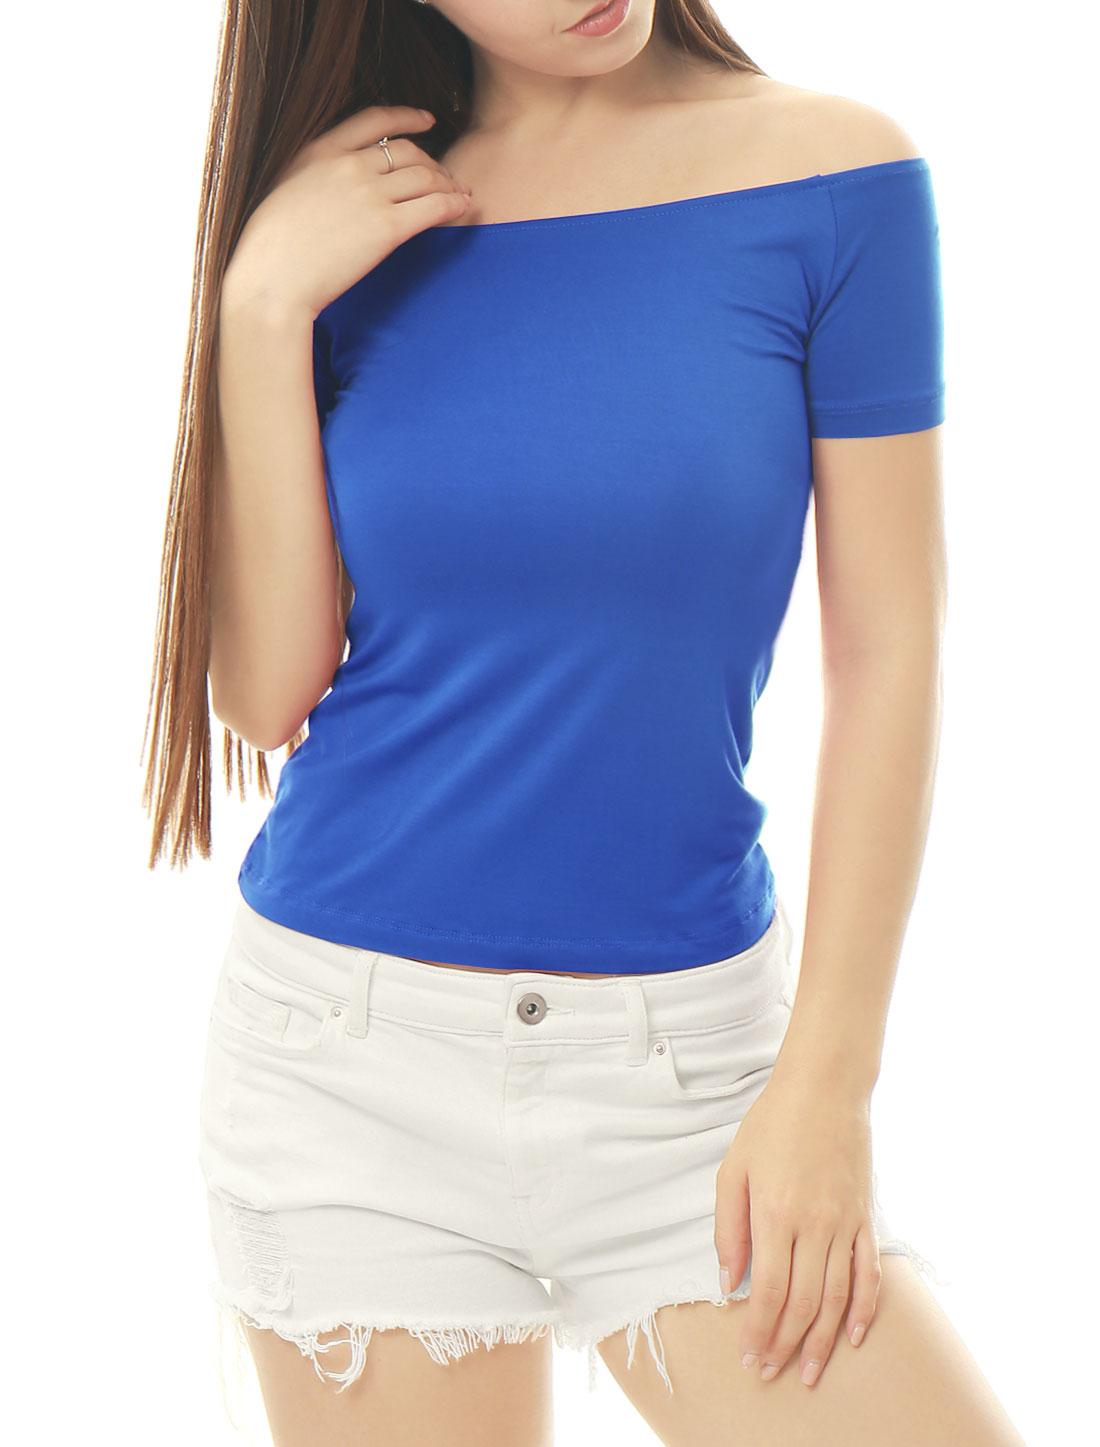 Women Short Sleeves Slim Fit Off the Shoulder Top Royal Blue XL